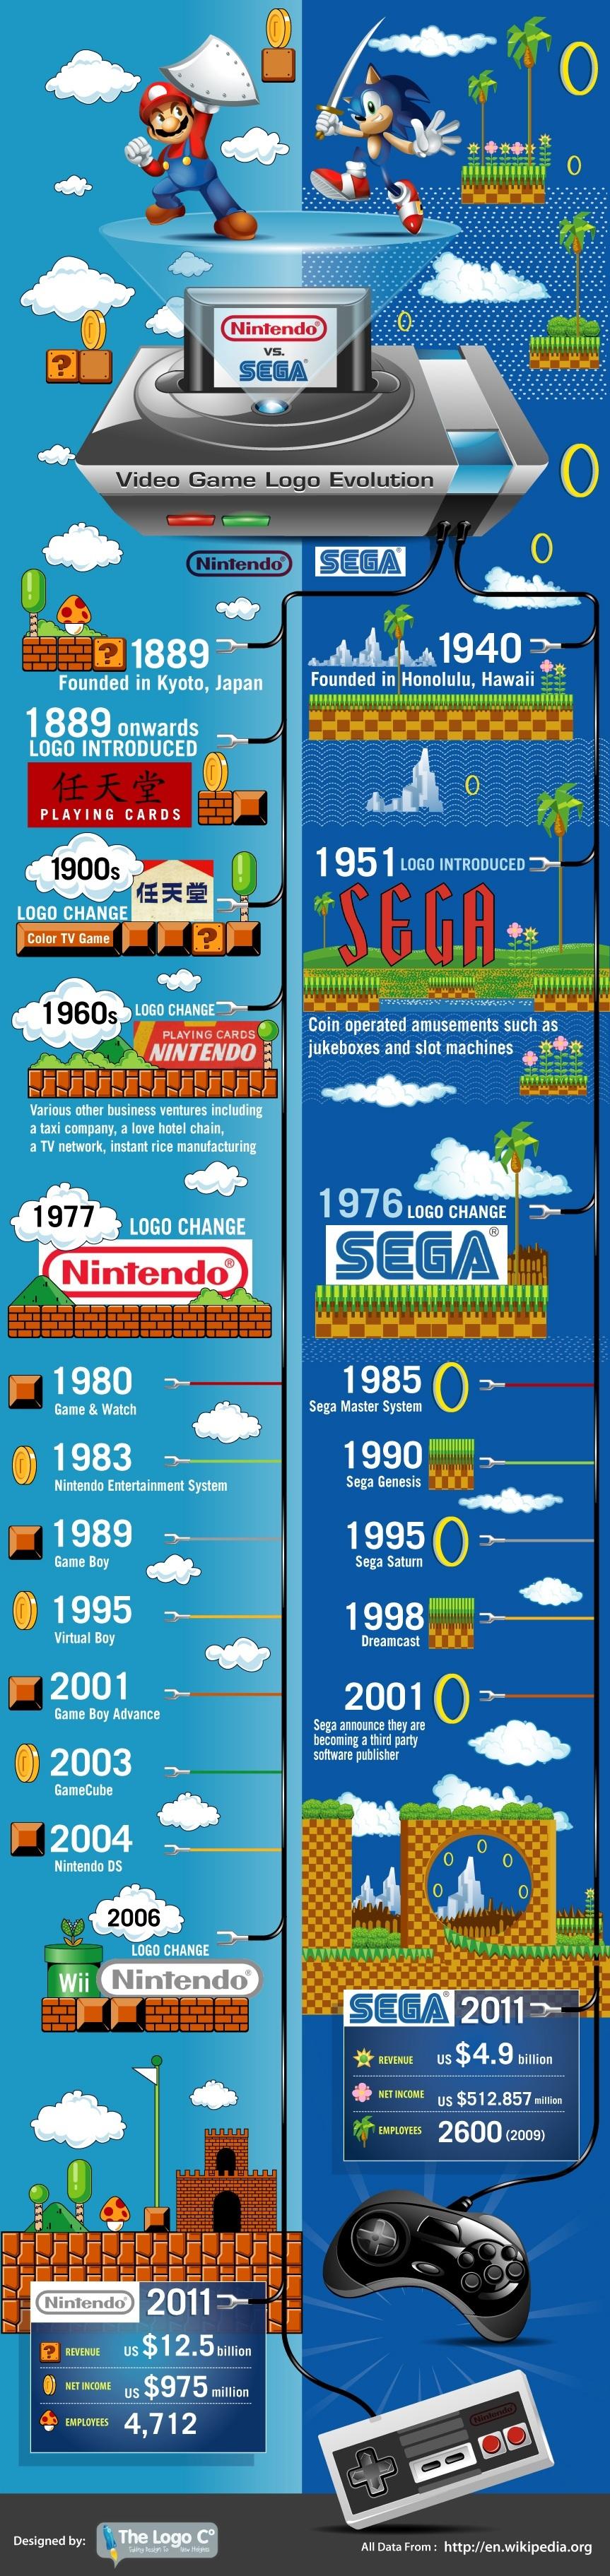 Sony-Mario-Game-Evolution